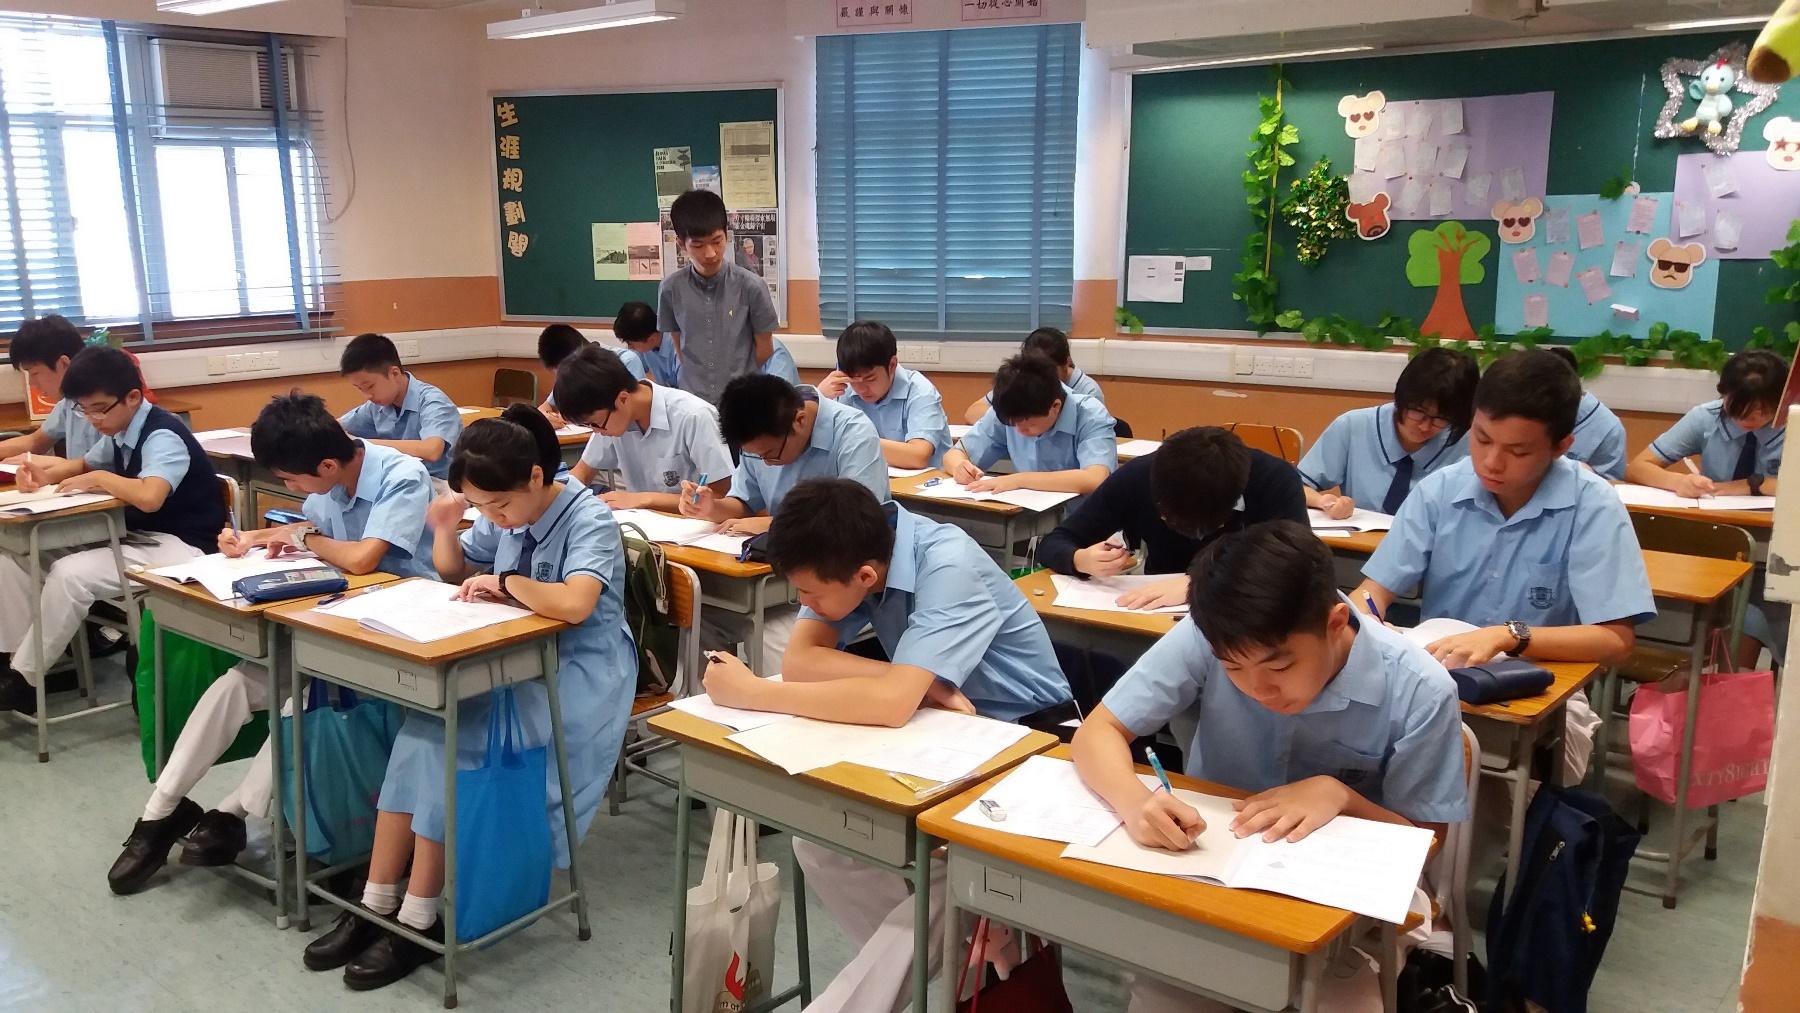 http://npc.edu.hk/sites/default/files/20181006_102039.jpg